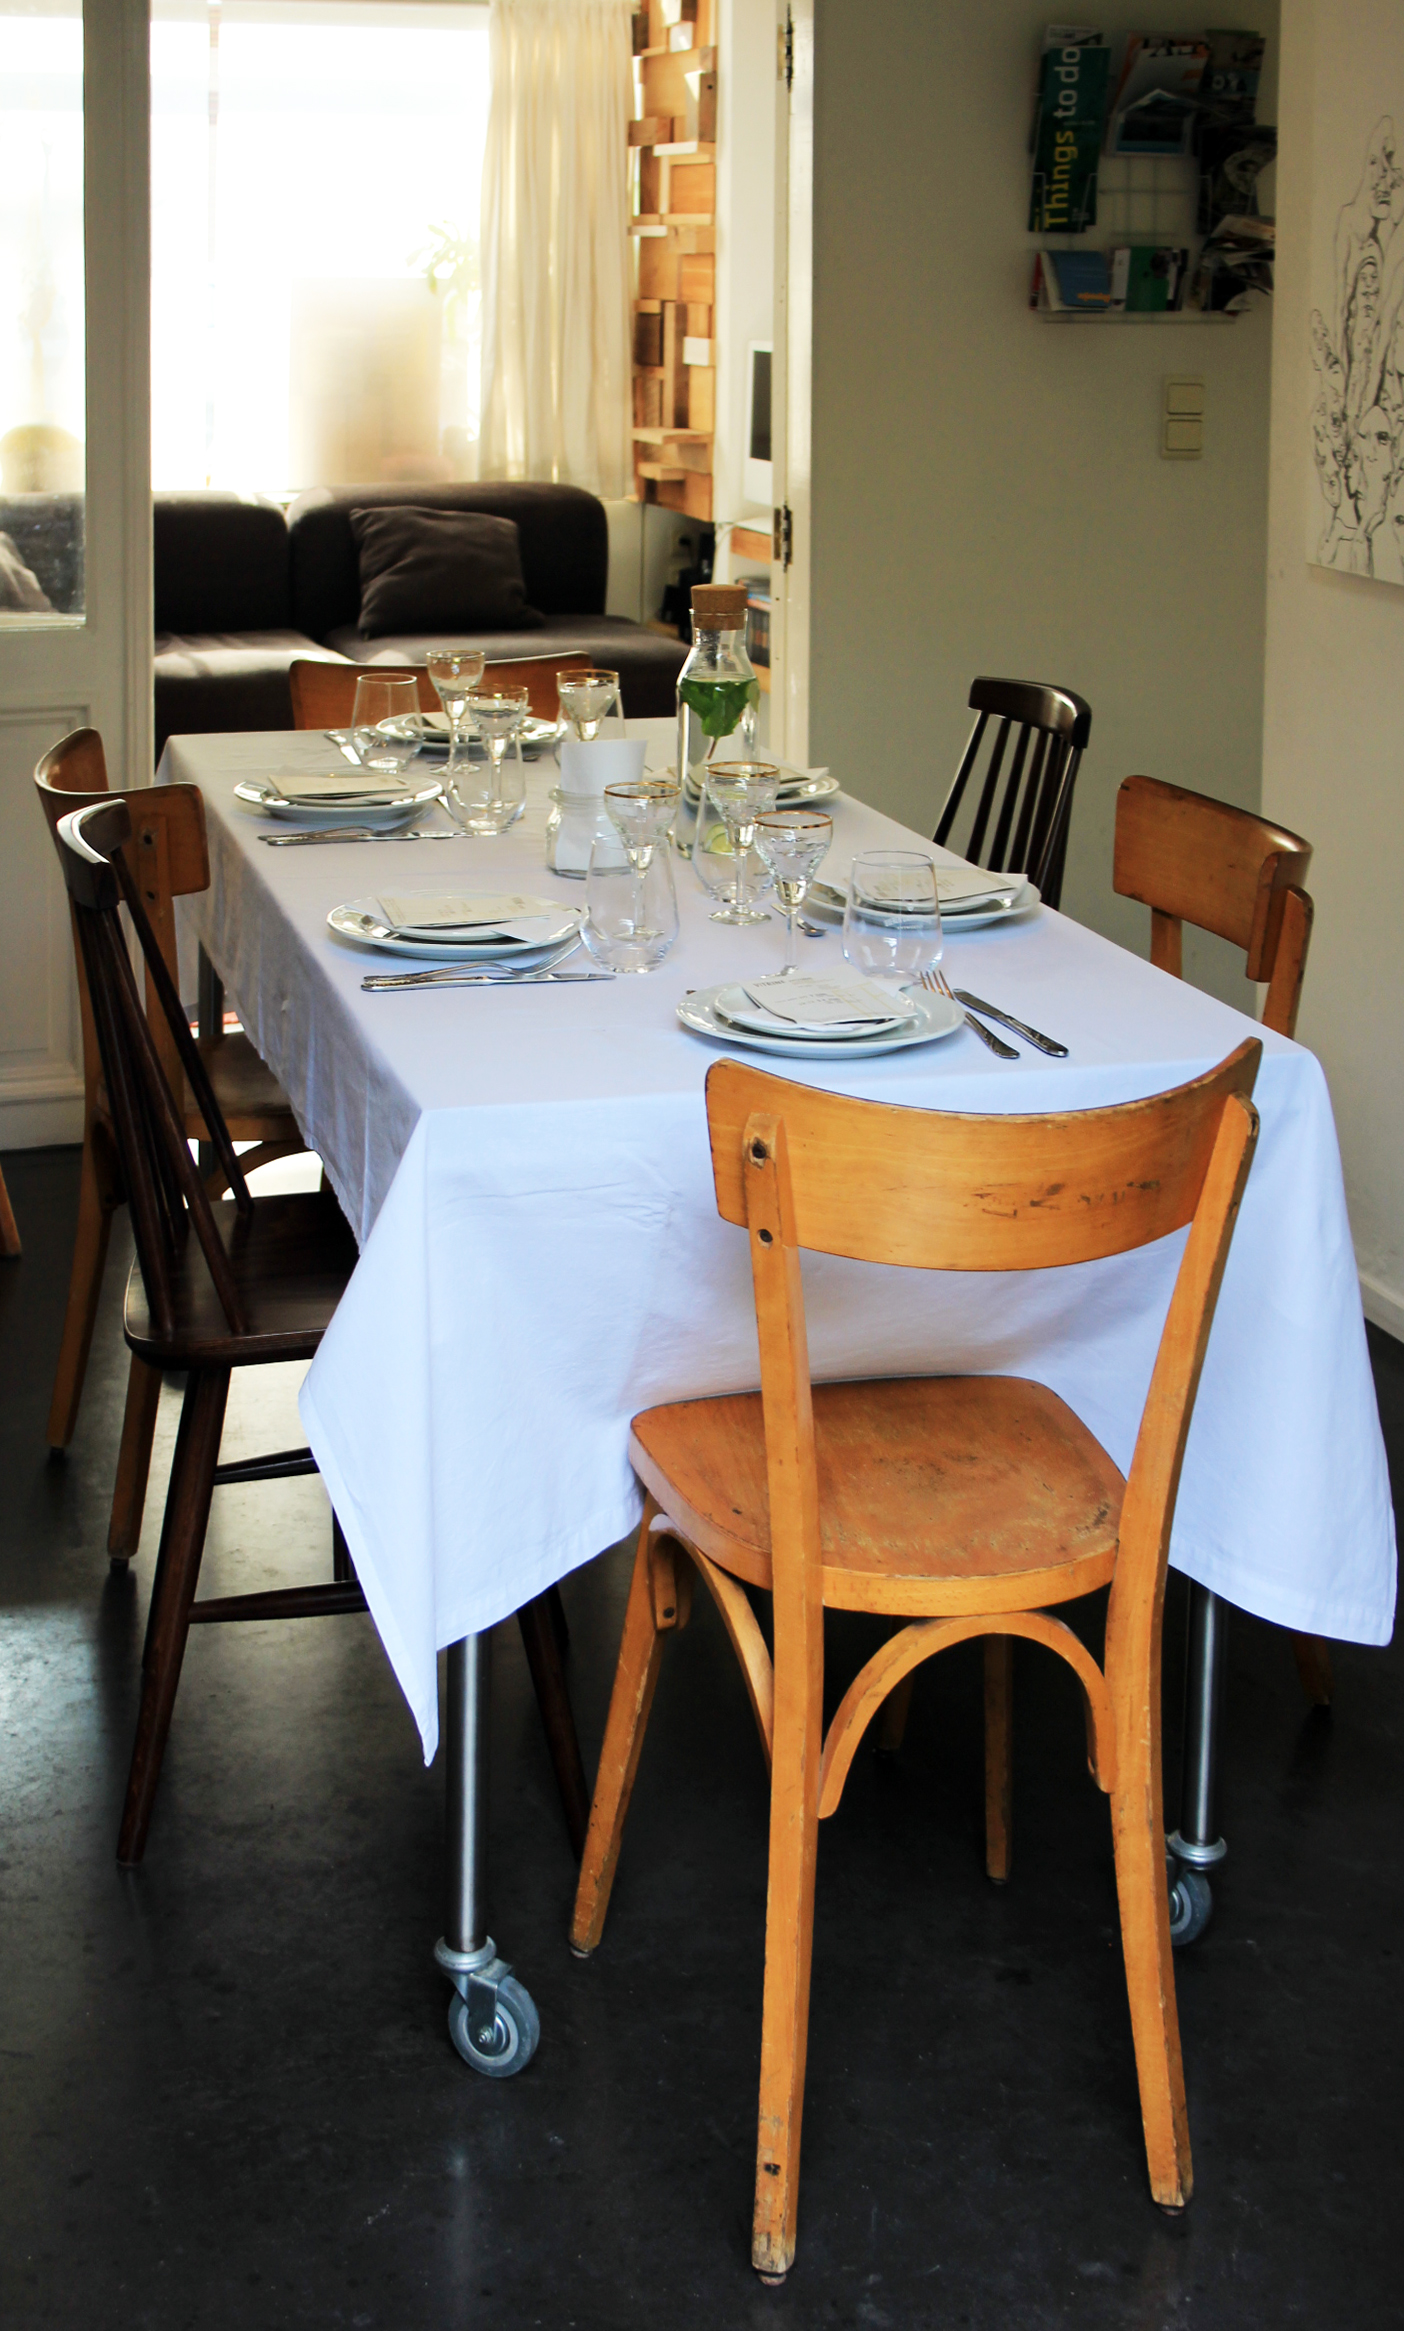 tafels03.jpg